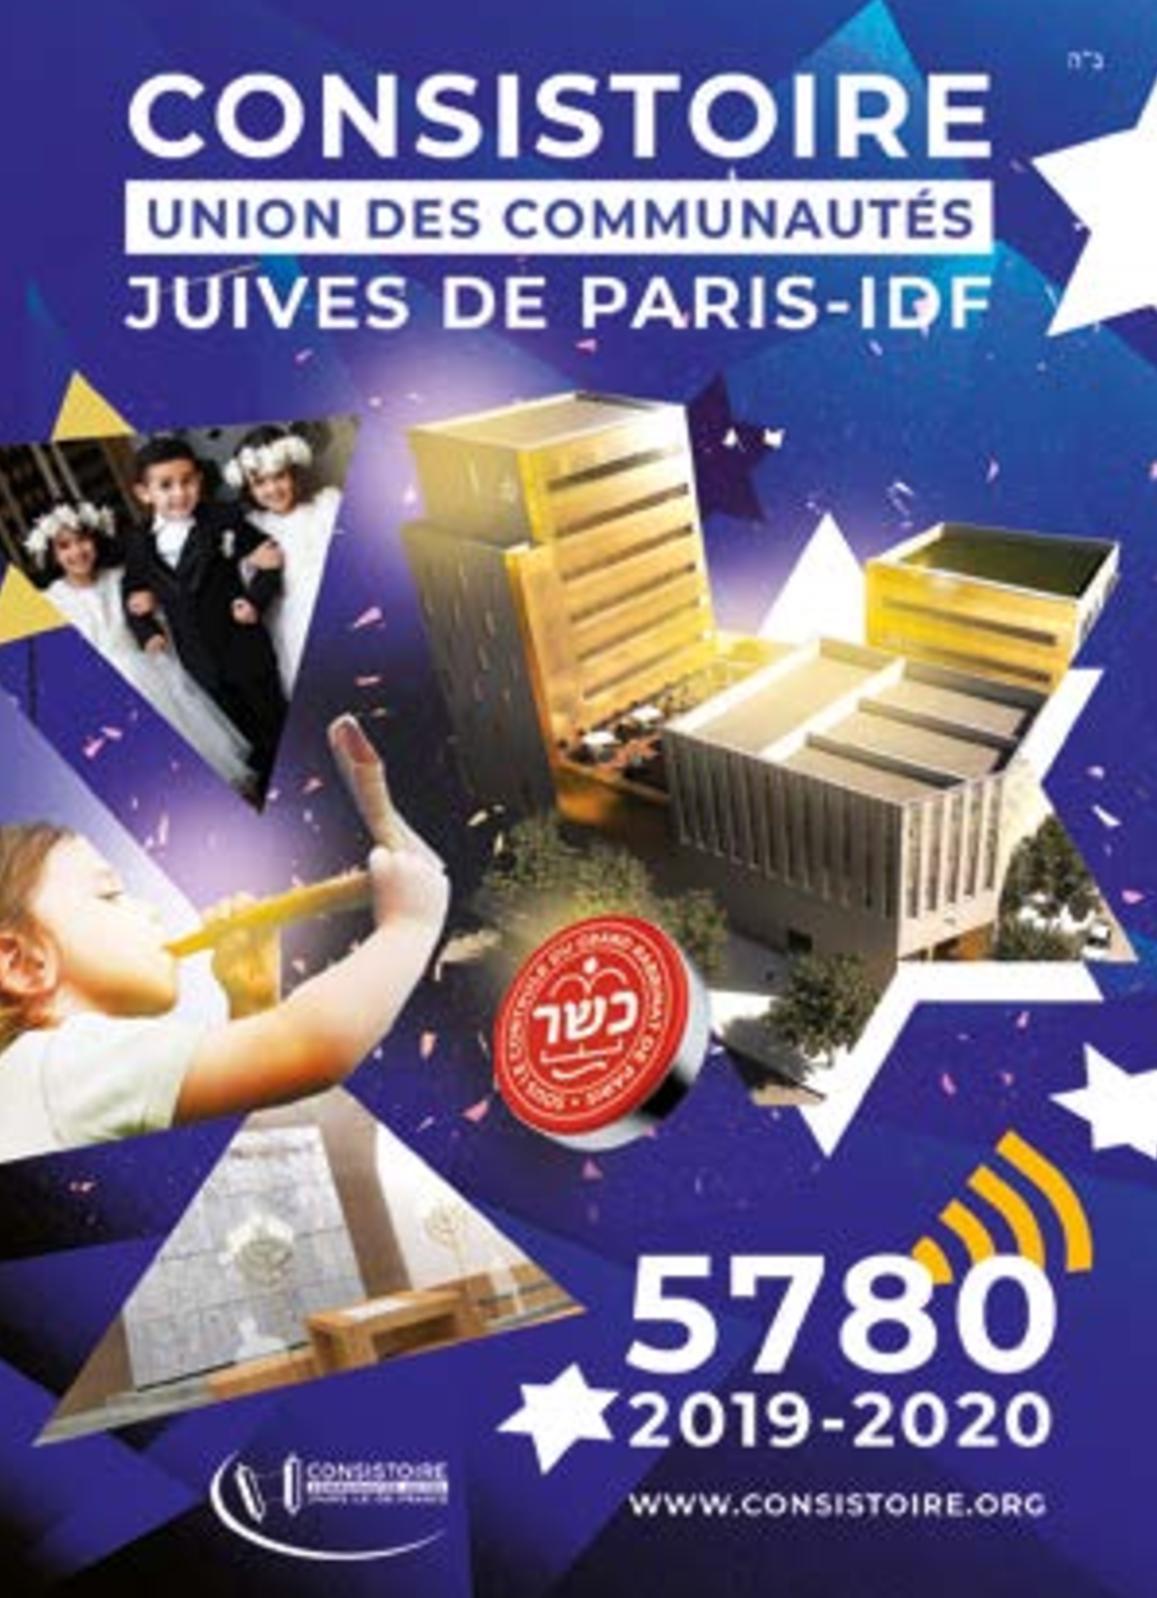 Vita Confort 25 Rue Lecourbe calaméo - annuaire consistoire paris idf 2019